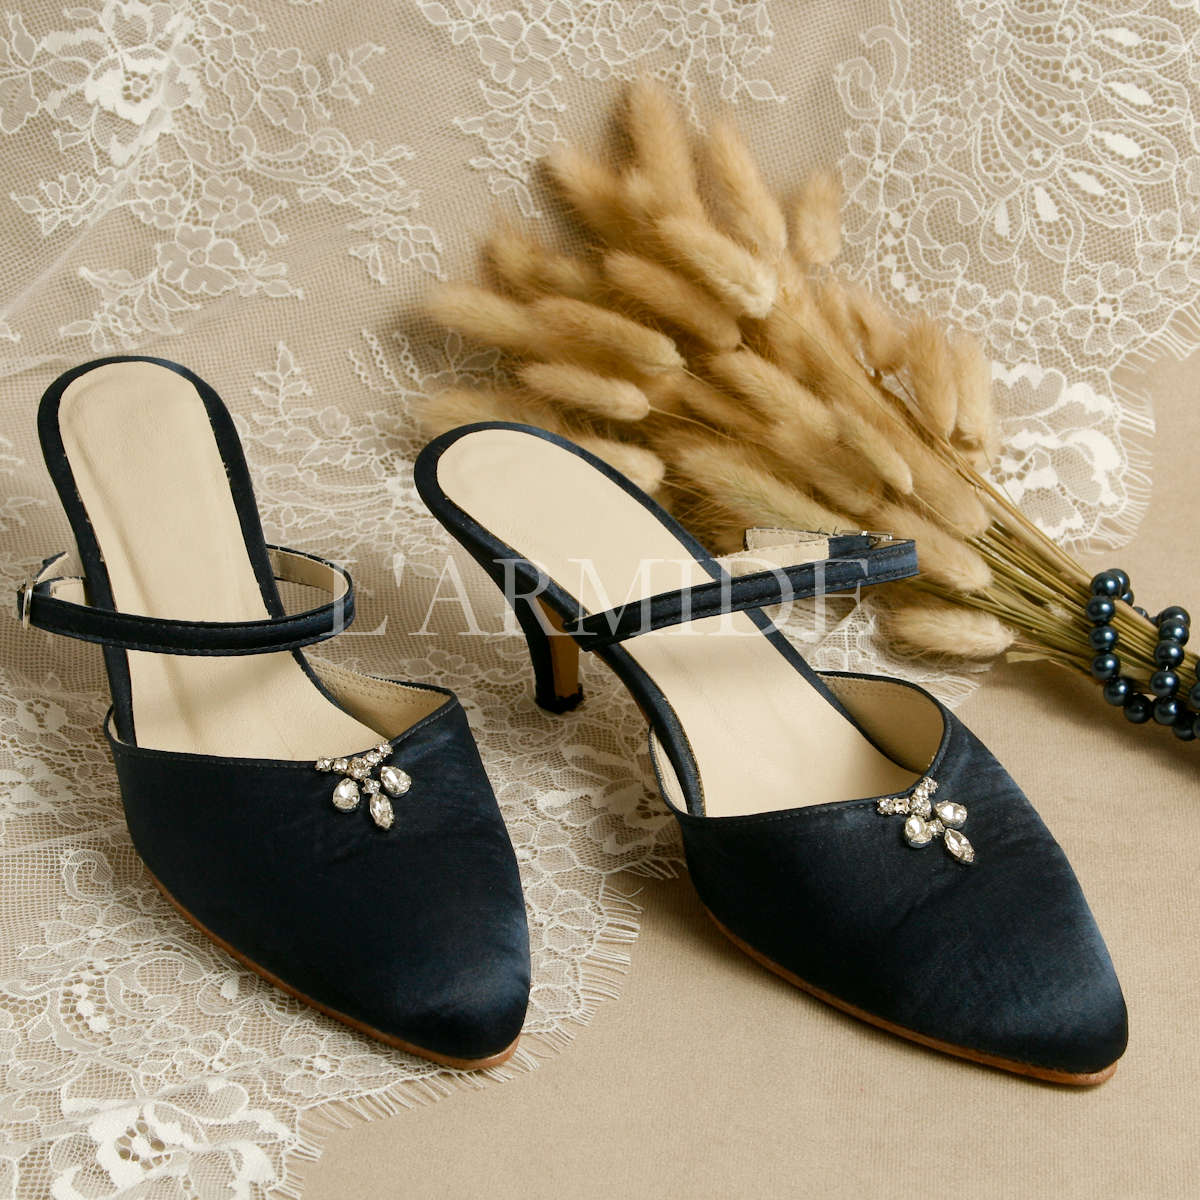 zapatos-de-novia-kitten-heels-raso-azul-broche-strass-buenos-aires-argentina-larmide-1200-_MG_3473.jpg